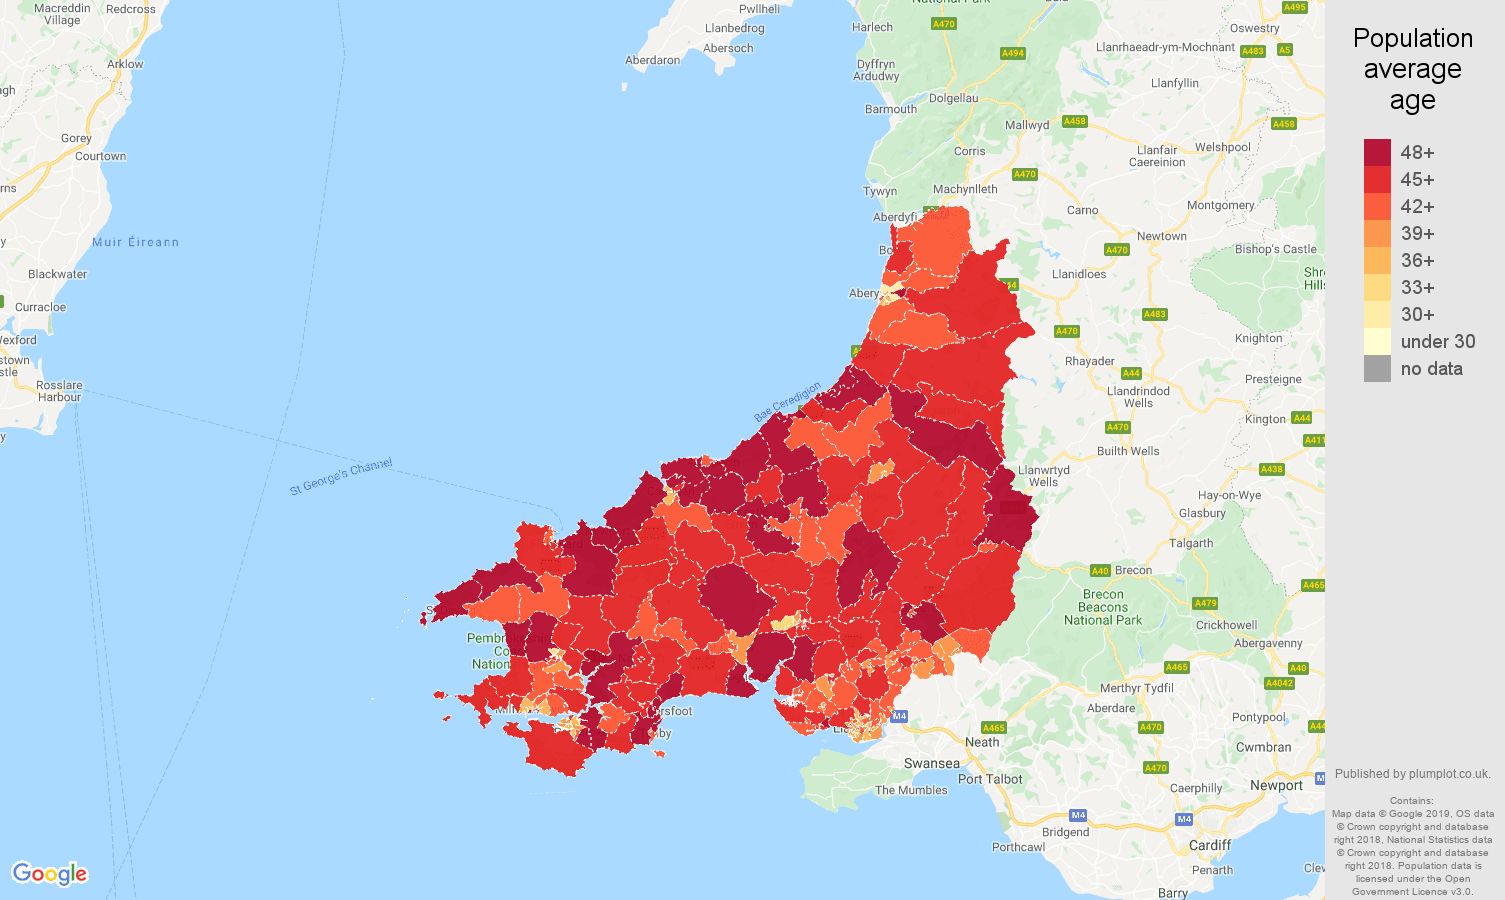 Dyfed population average age map